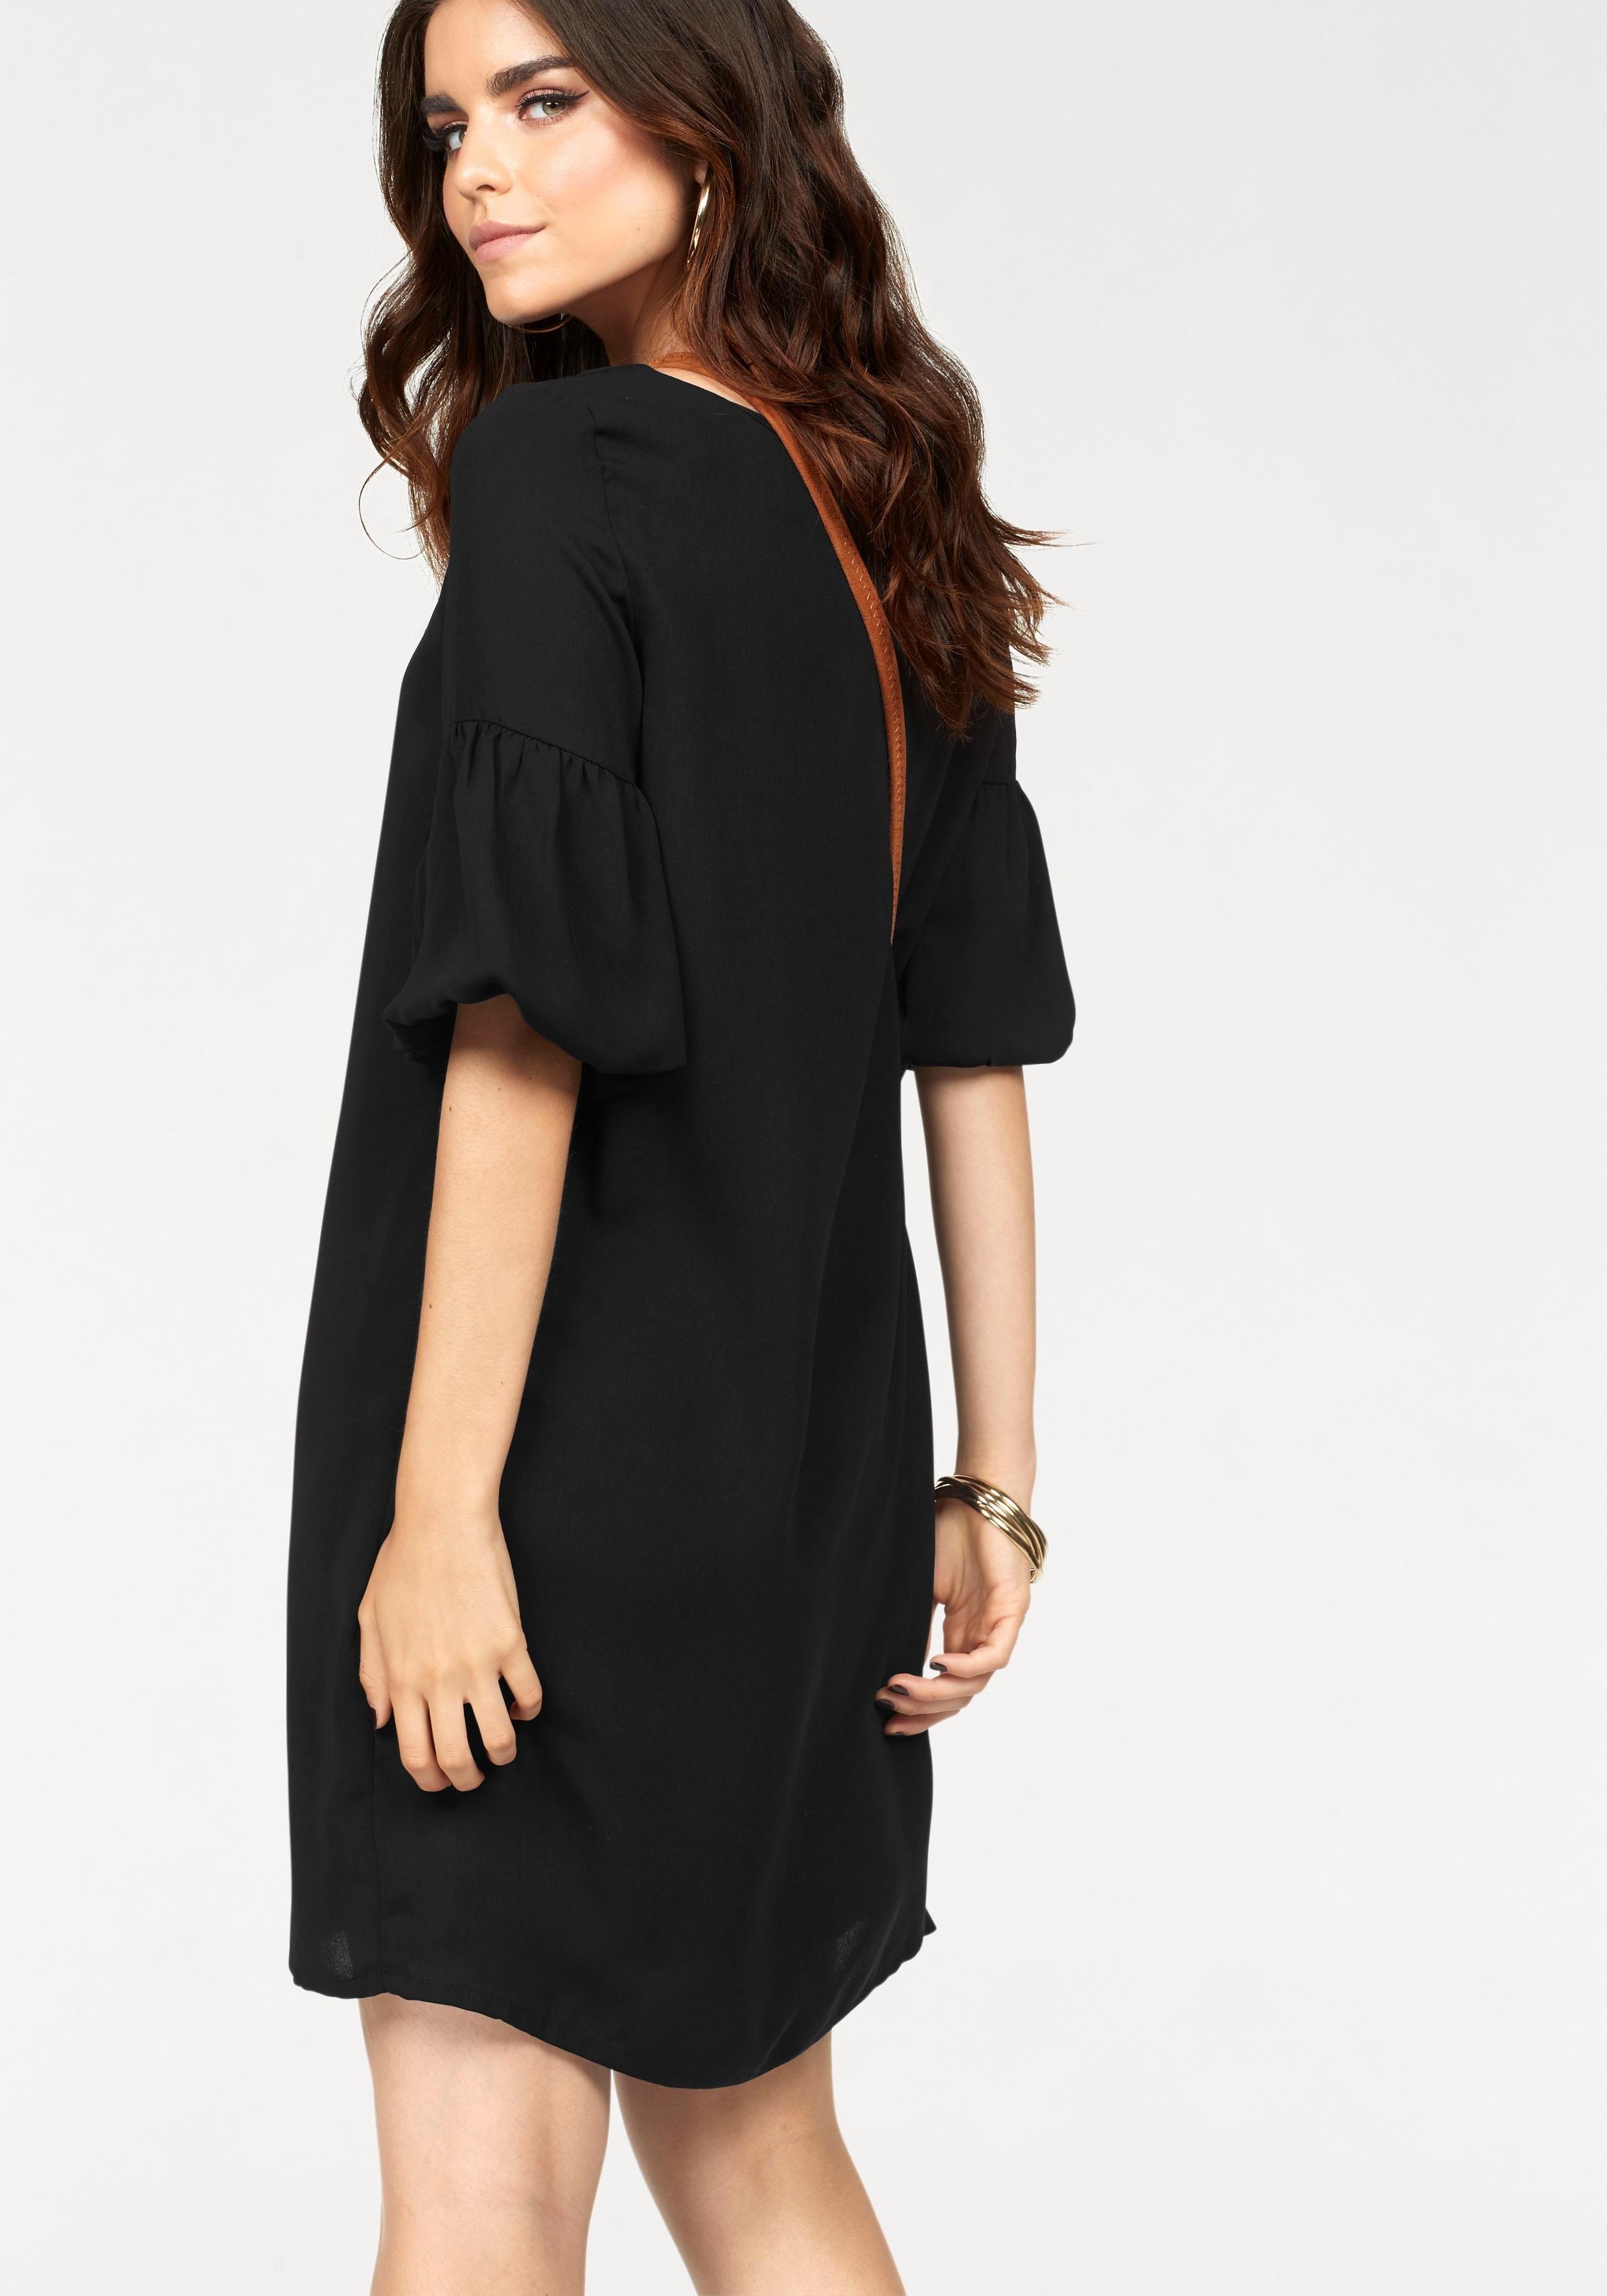 Vero moda jurk zwart kant